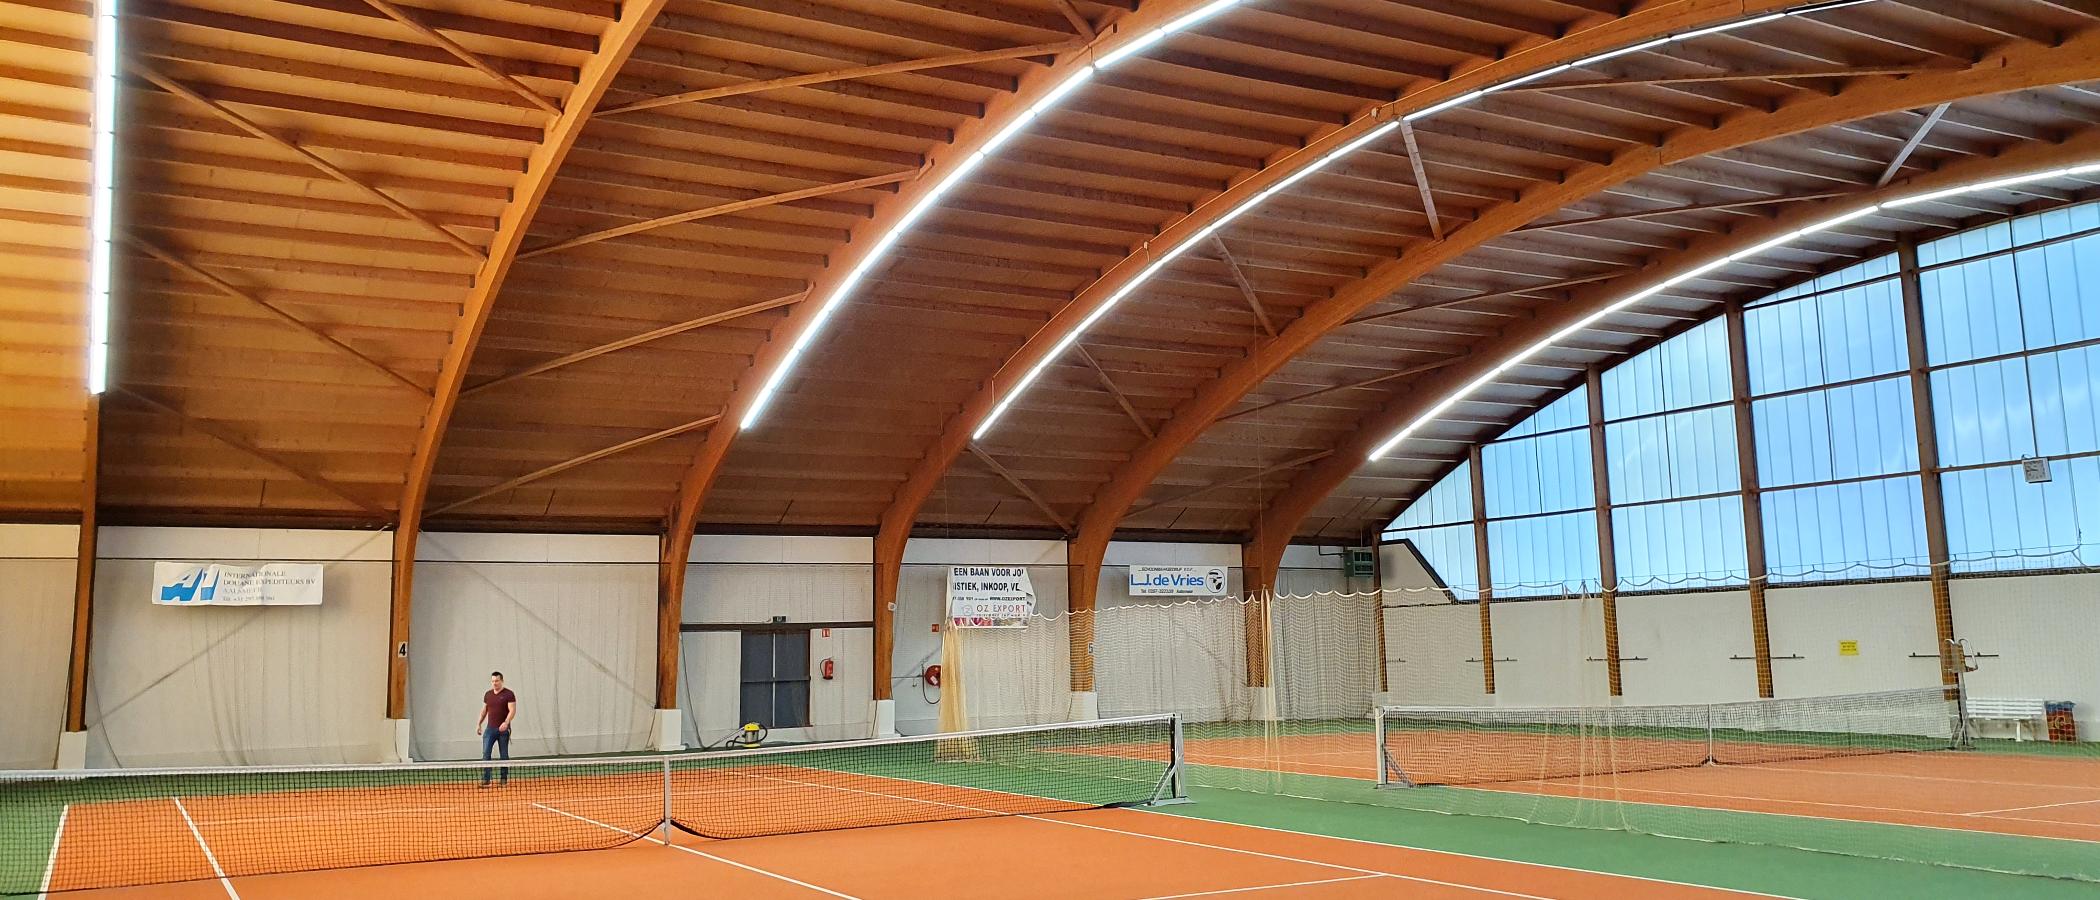 BAIYILED LED Tennis verlichting geïnstalleerd met Aurora LED Lijnverlichting